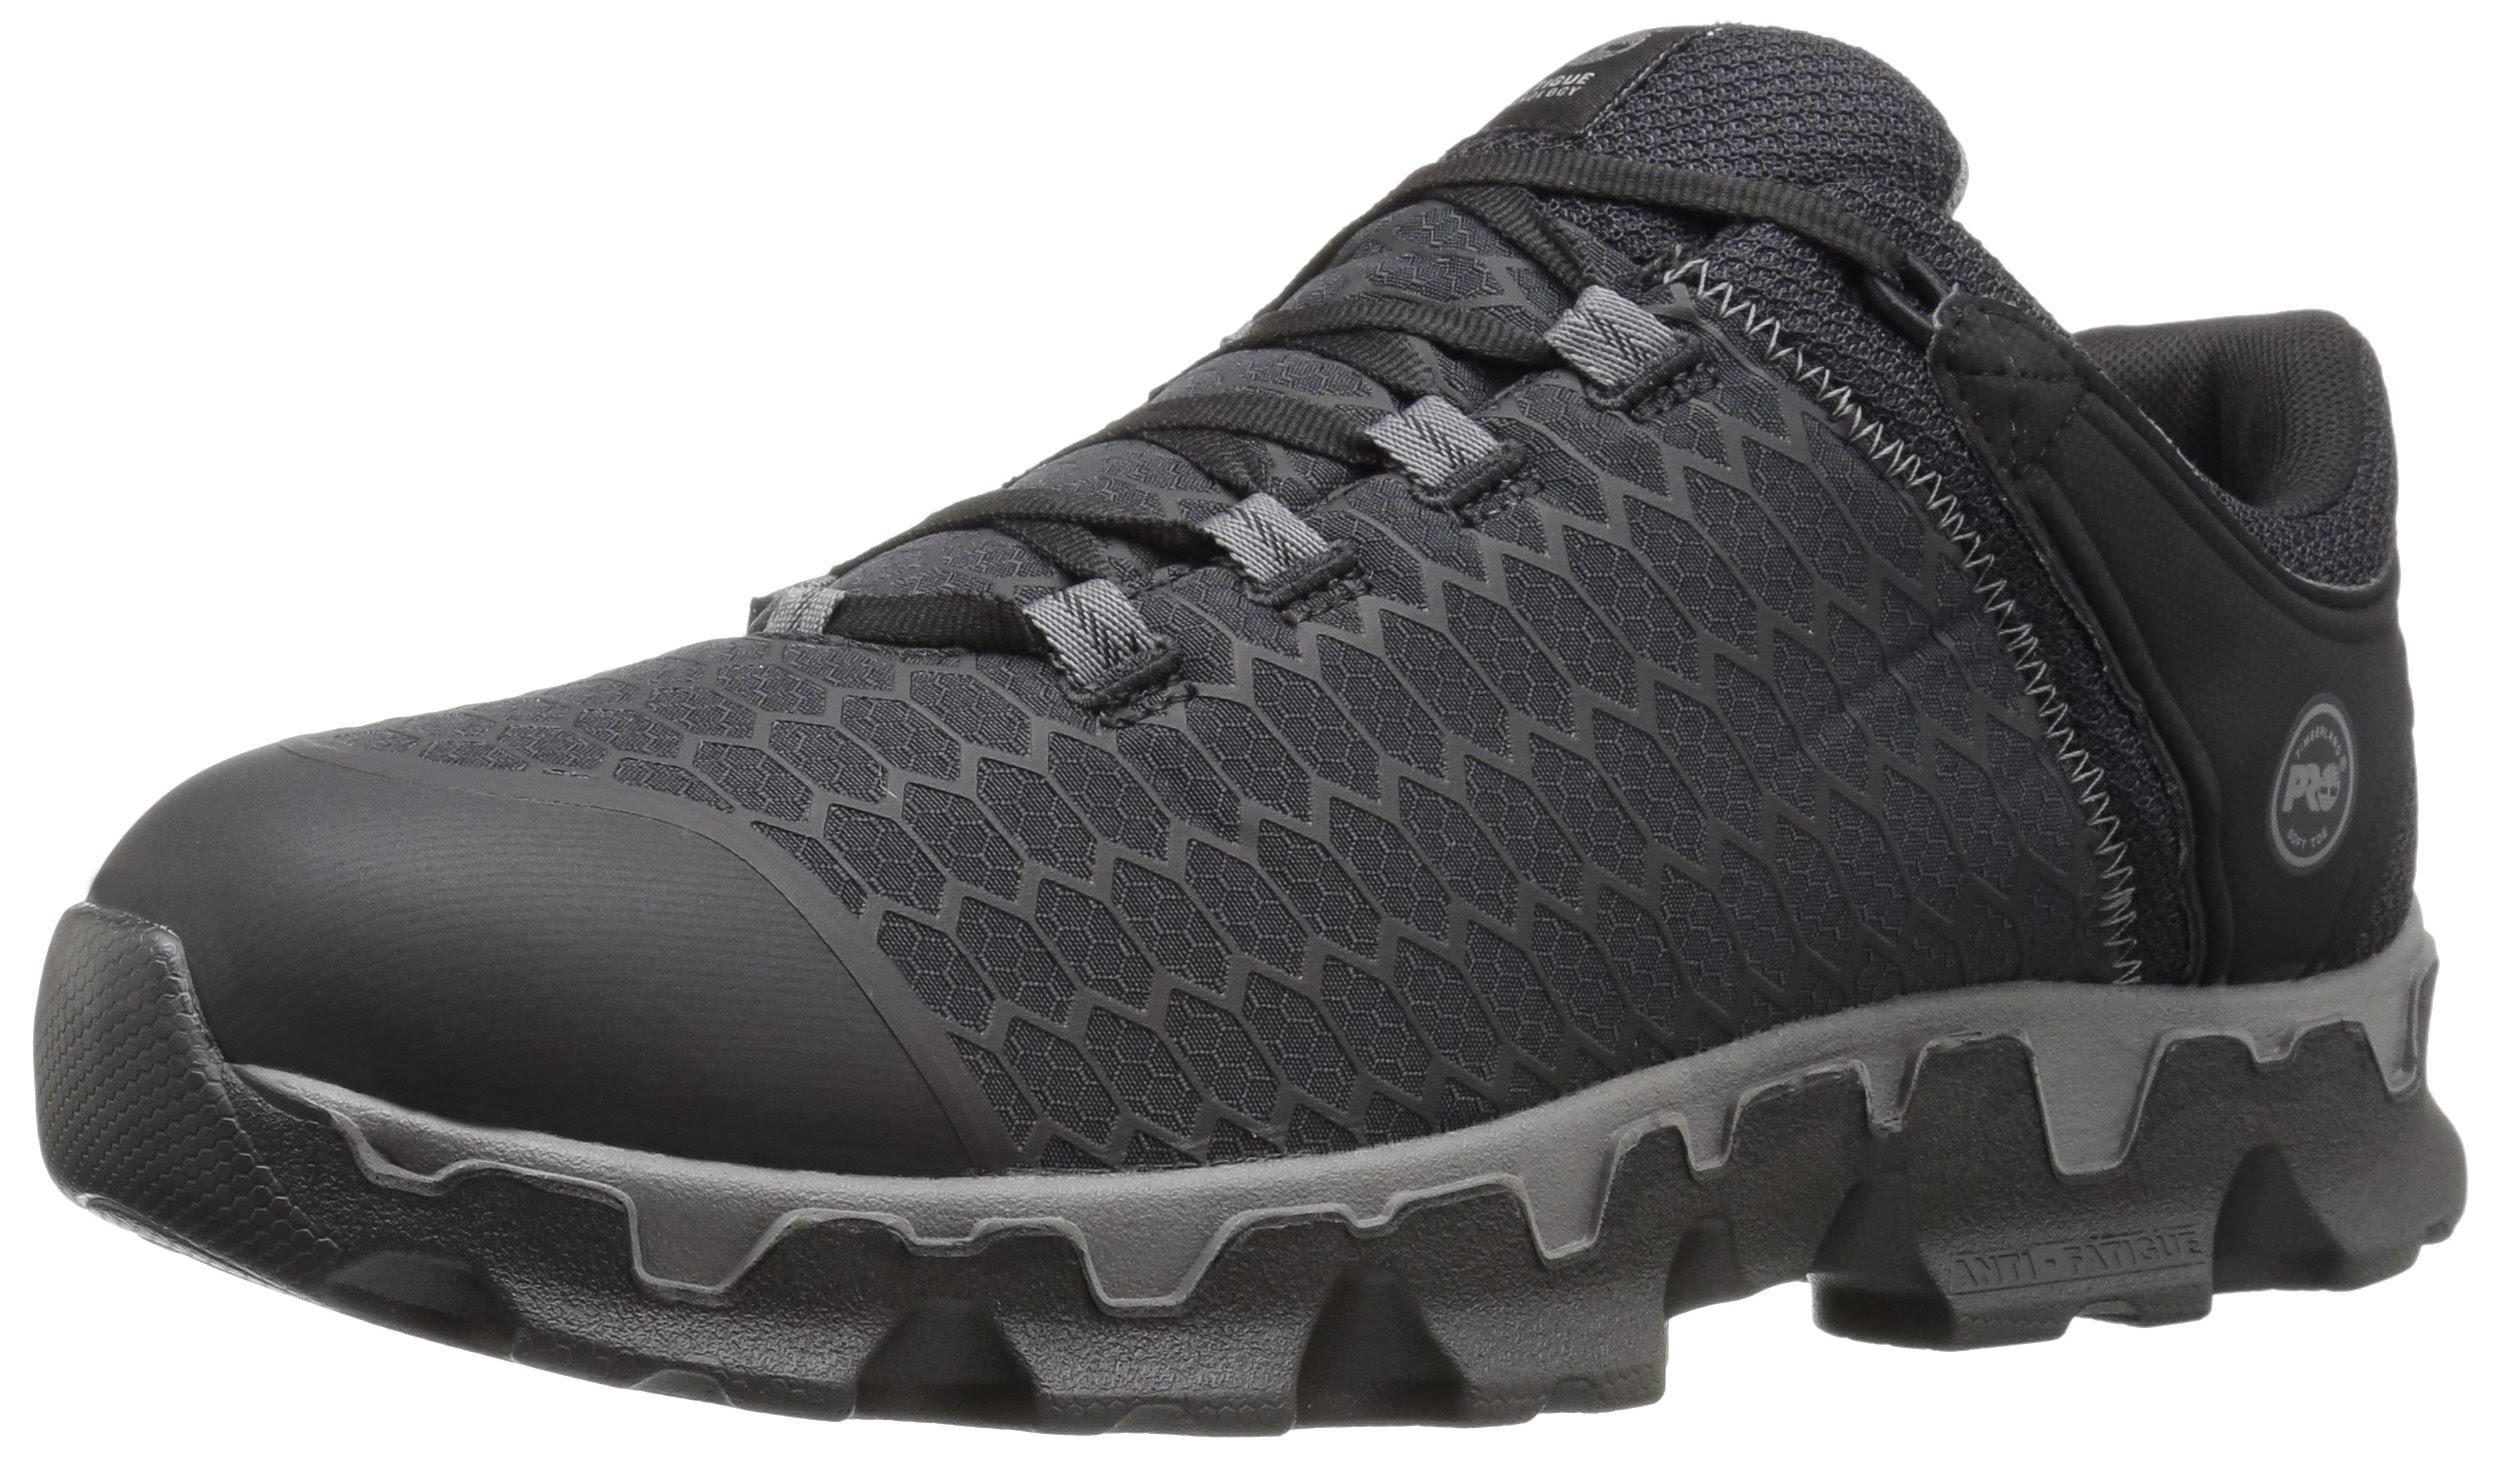 M Black Sport Timberland Powertrain Shoe Sdp 9 Men's Pro PUwU68xqag